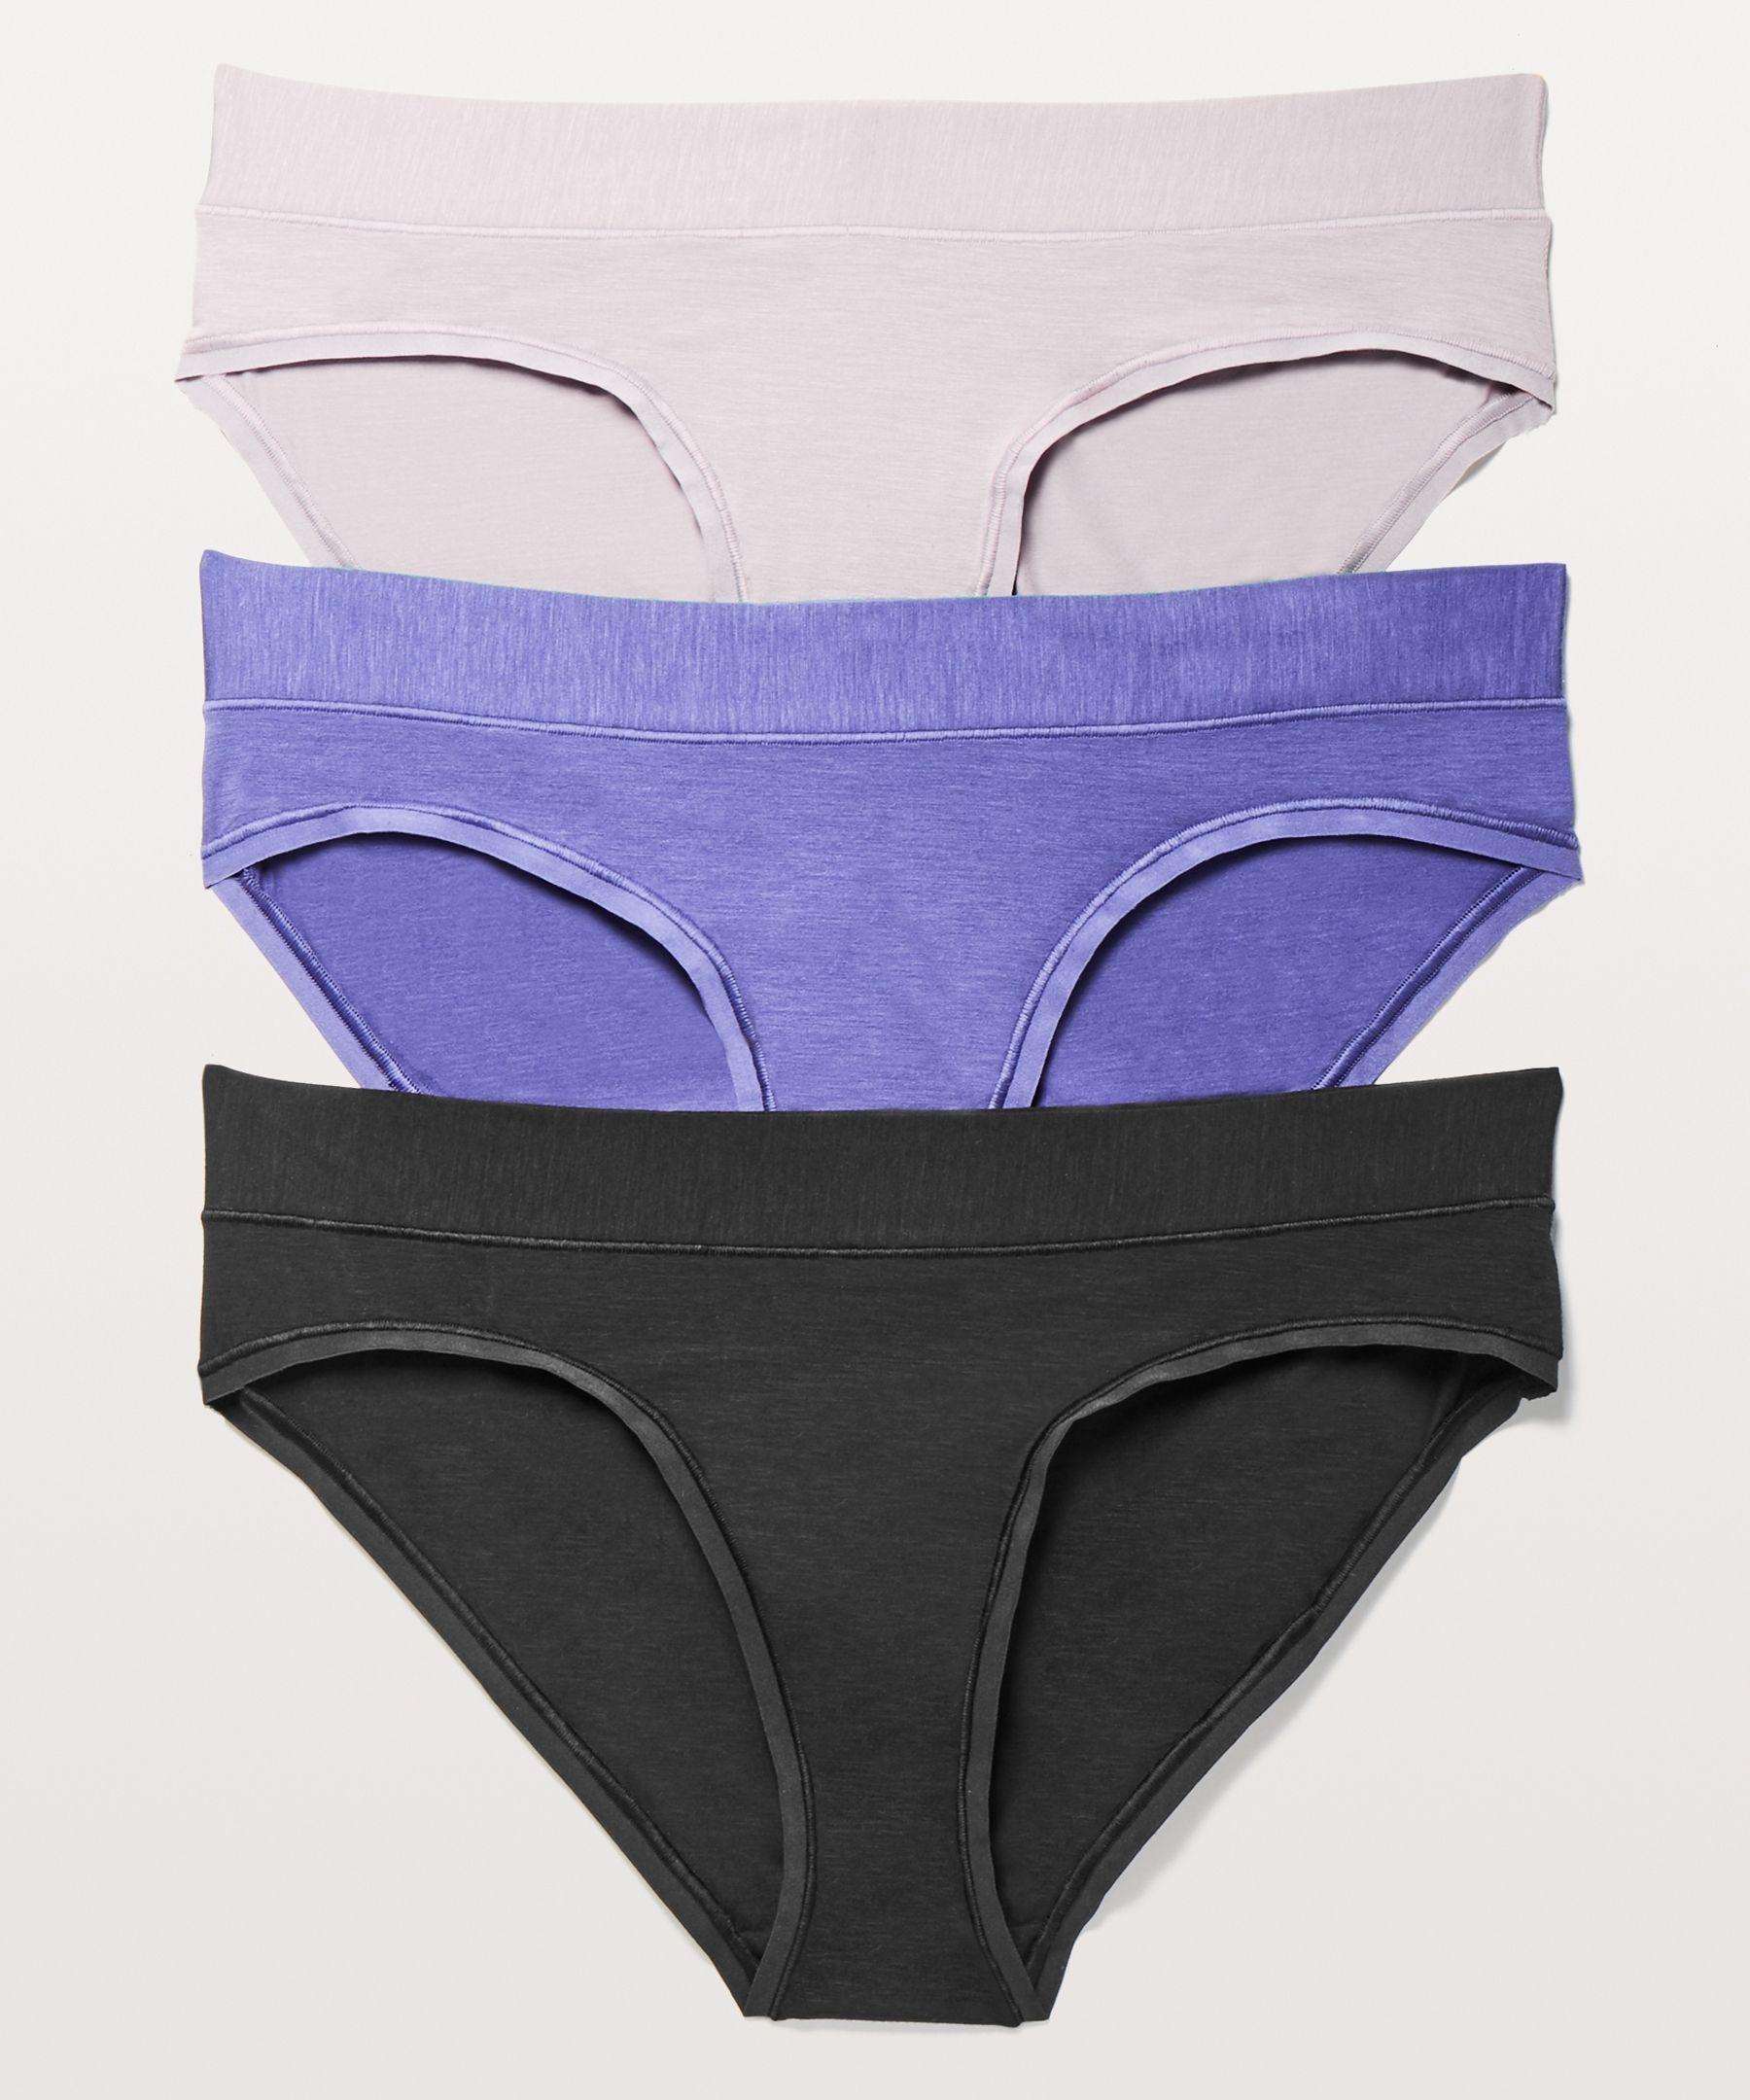 bf620577c9dad Mula Bandhawear Bikini  3 Pack